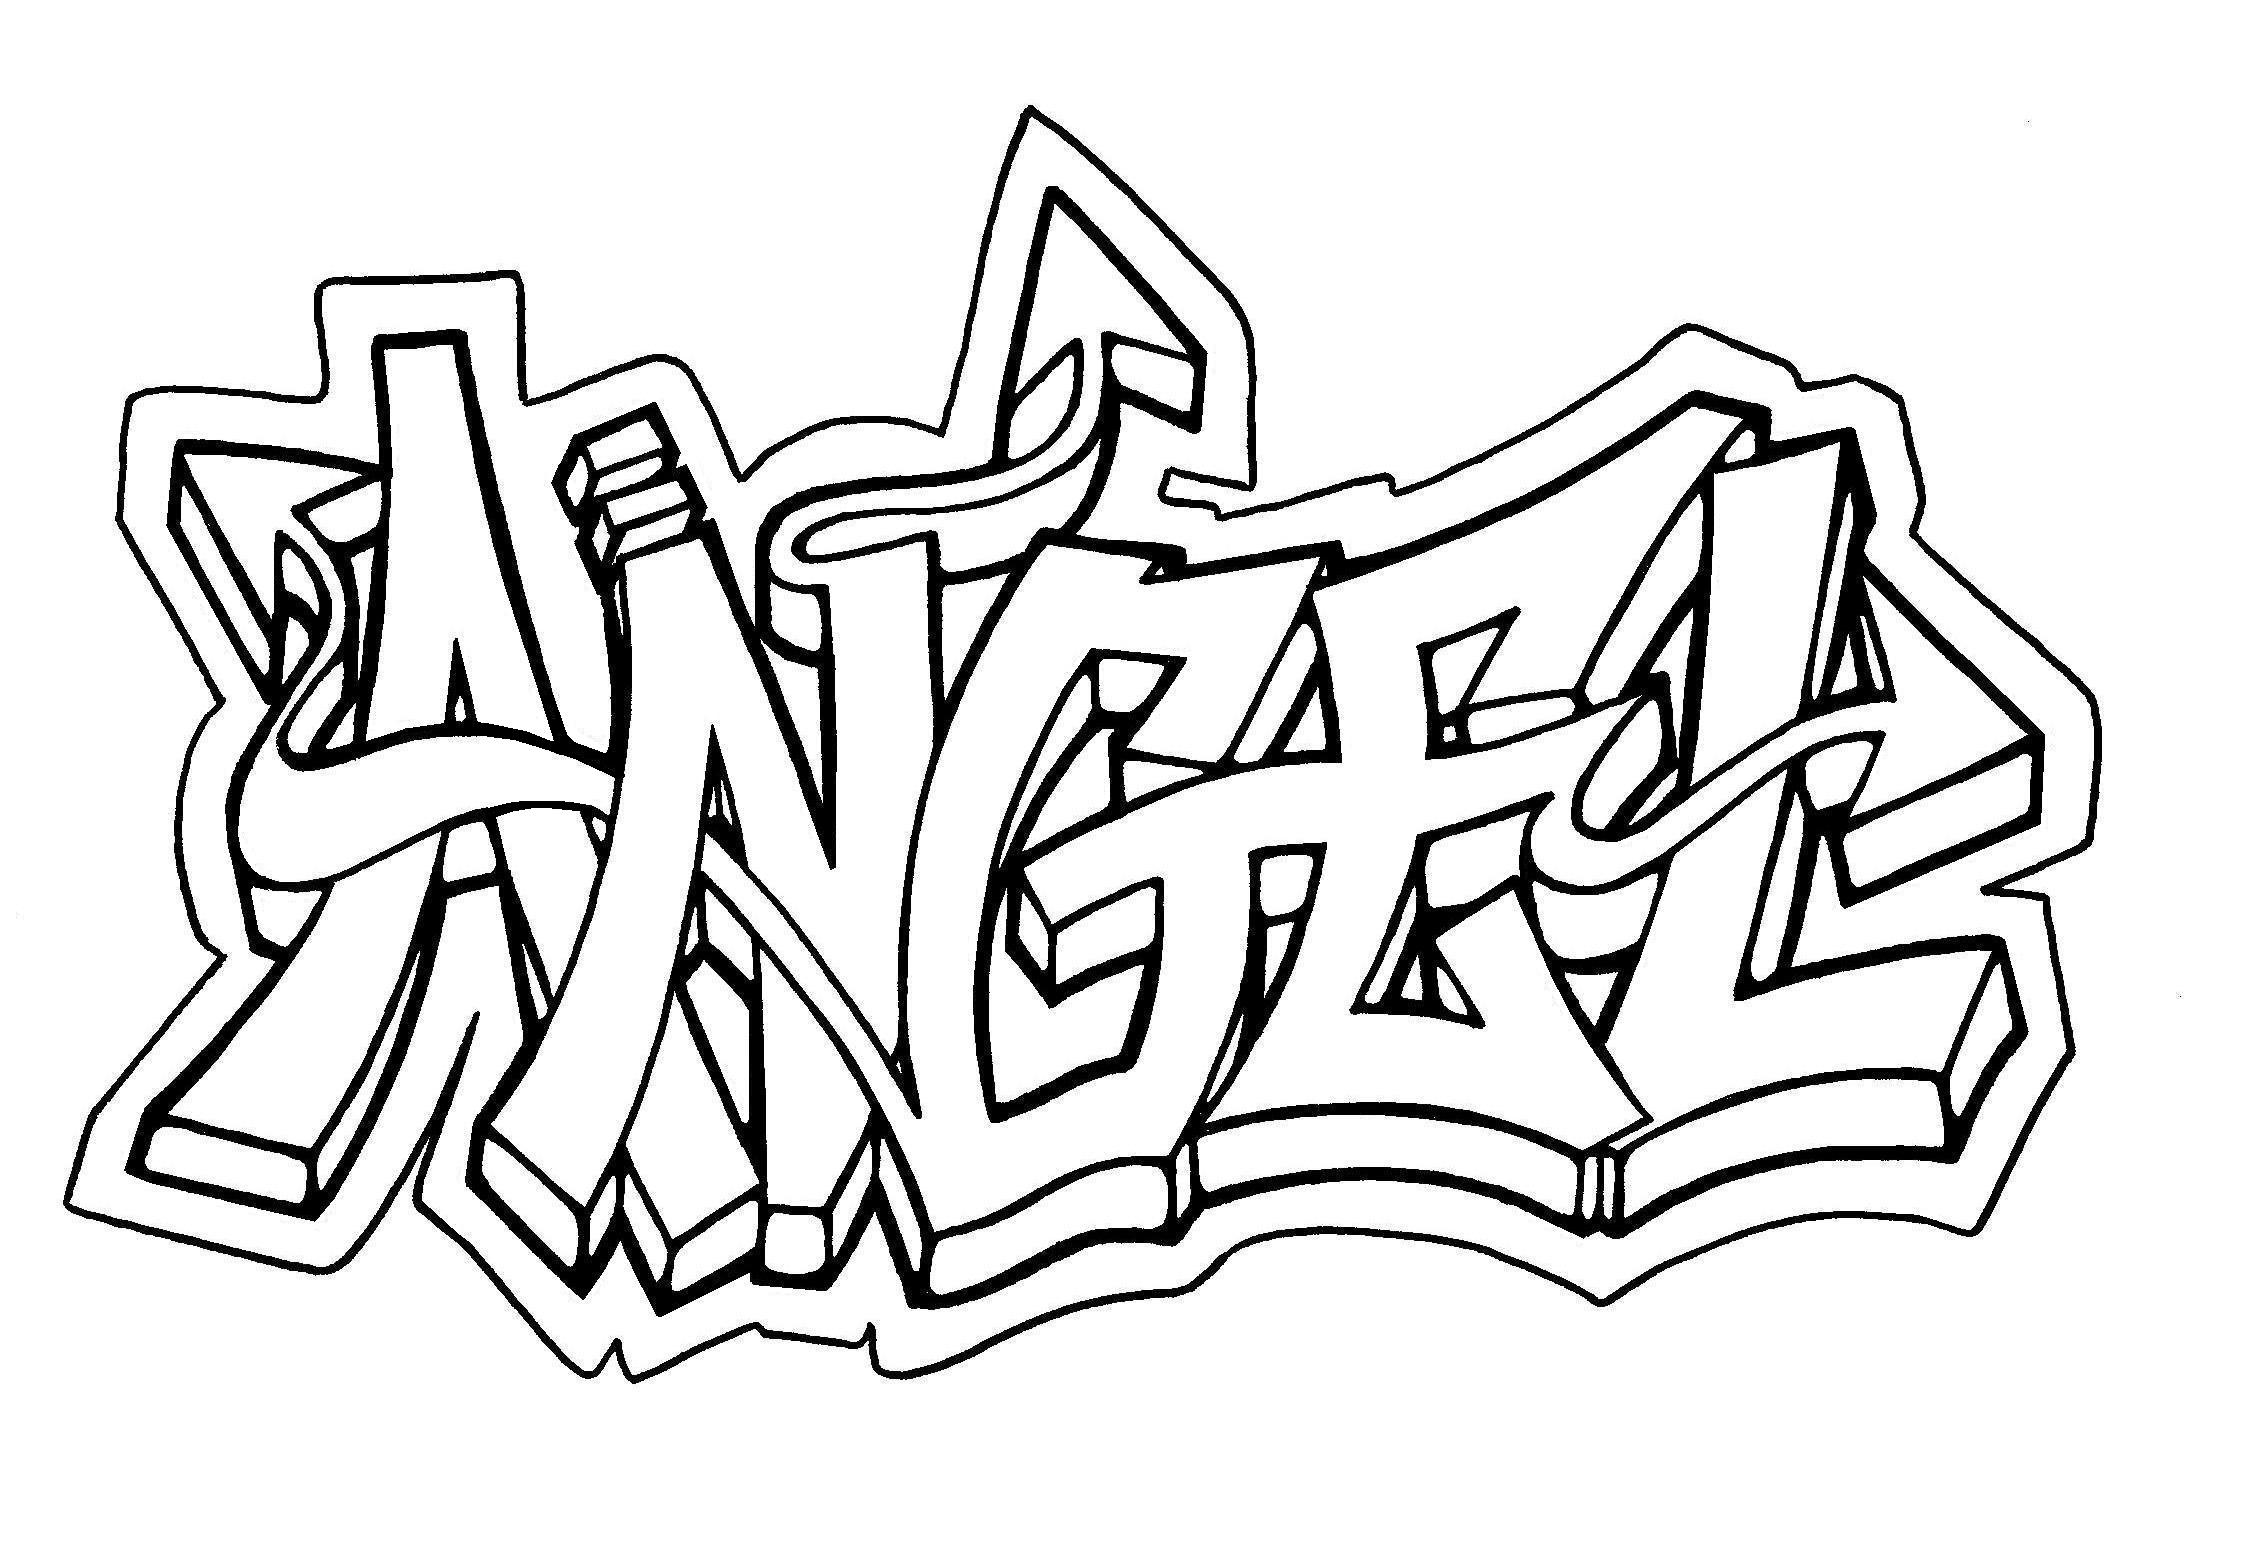 Drawn graffiti spirit #10